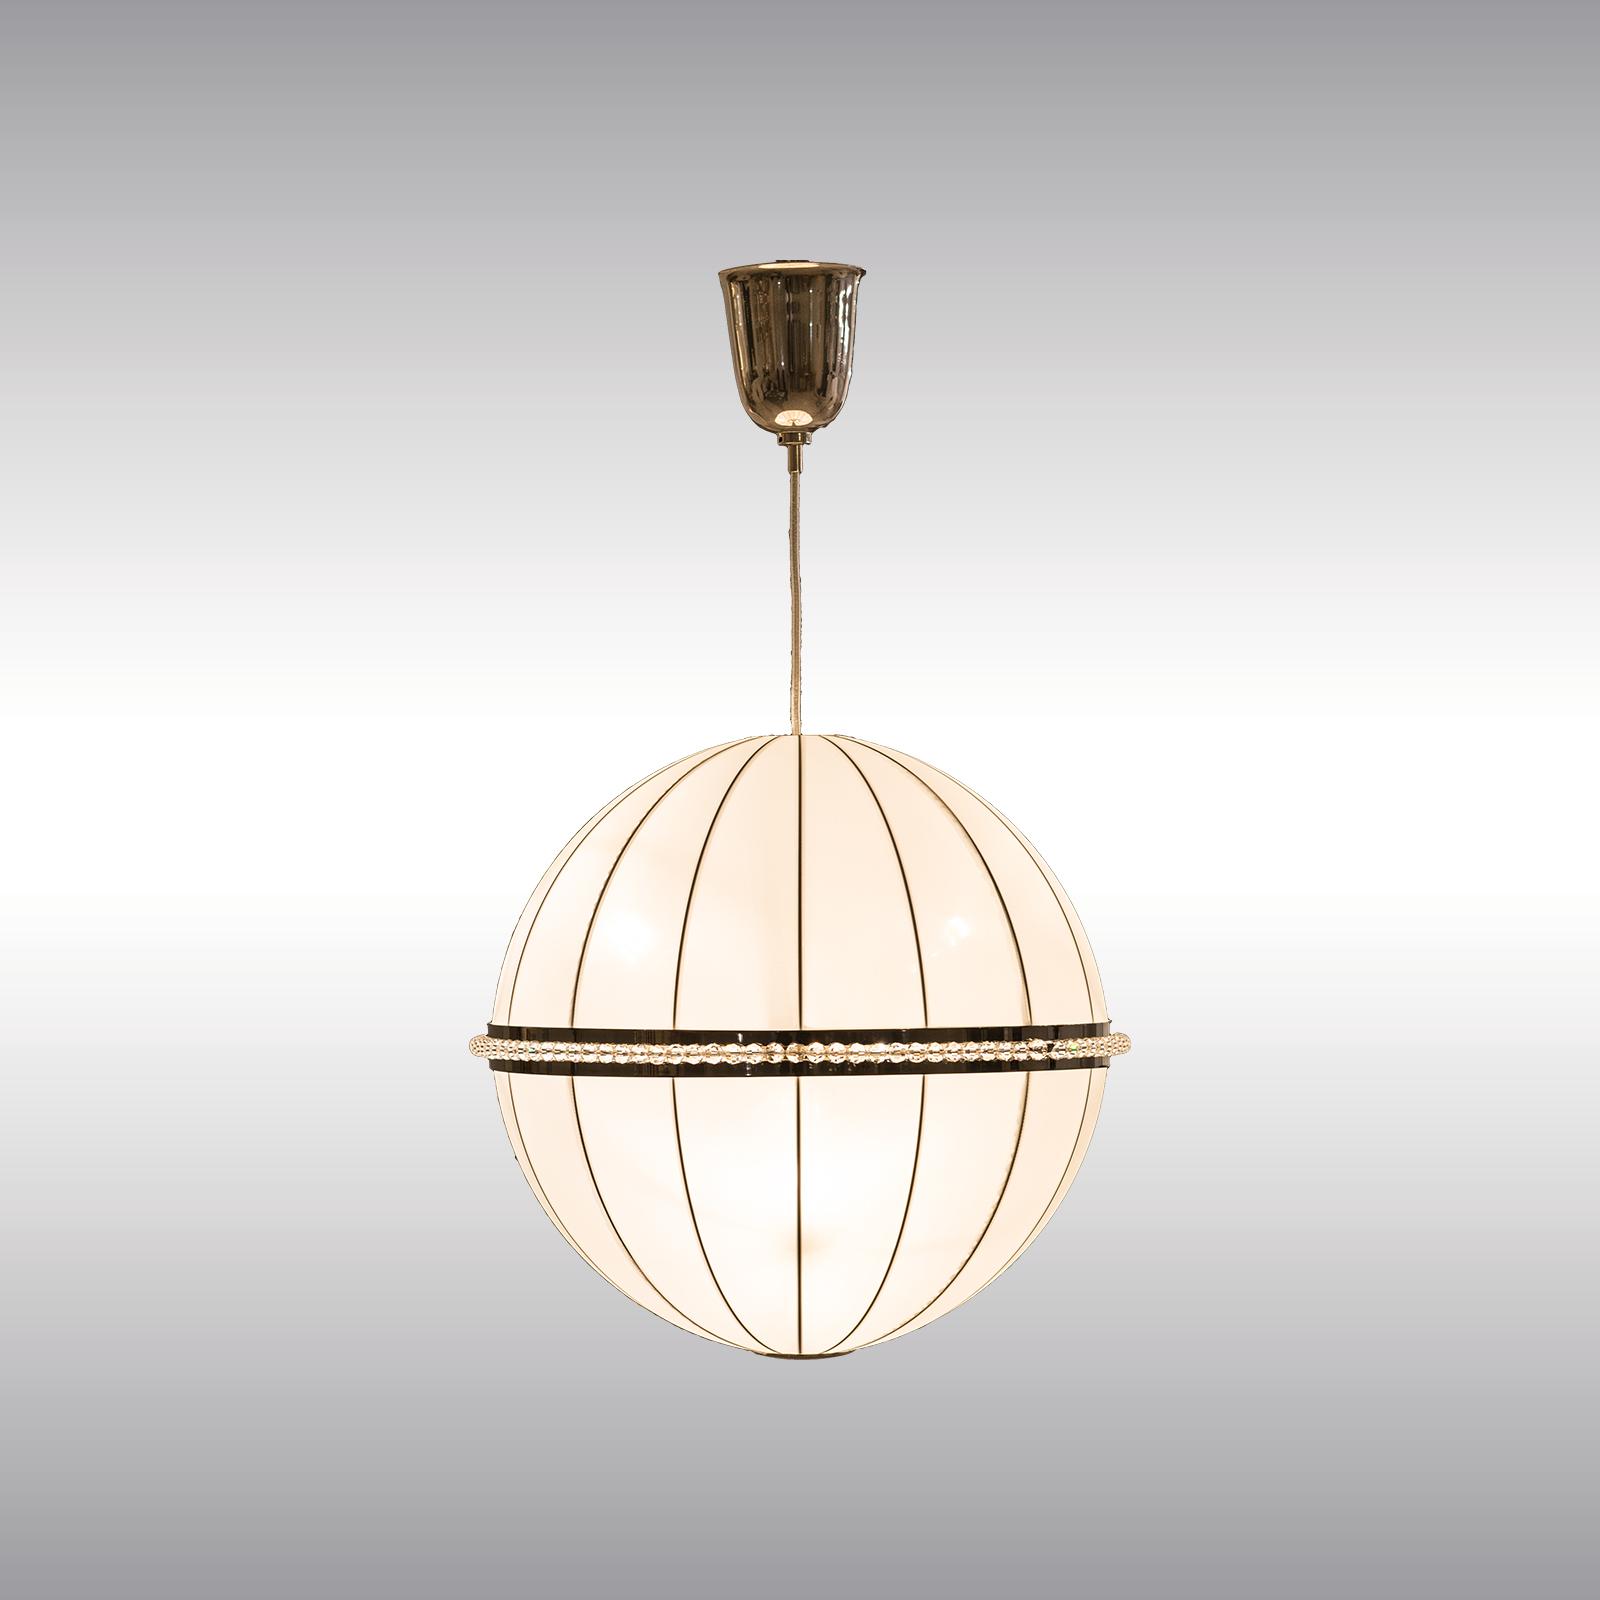 ICFF 2019 Amazing Woka Lamps and Furniture Designs - Josef Hoffmann icff ICFF 2019: Amazing Woka Lamps and Furniture Designs ICFF 2019 Amazing Woka Lamps and Furniture Designs Josef Hoffmann